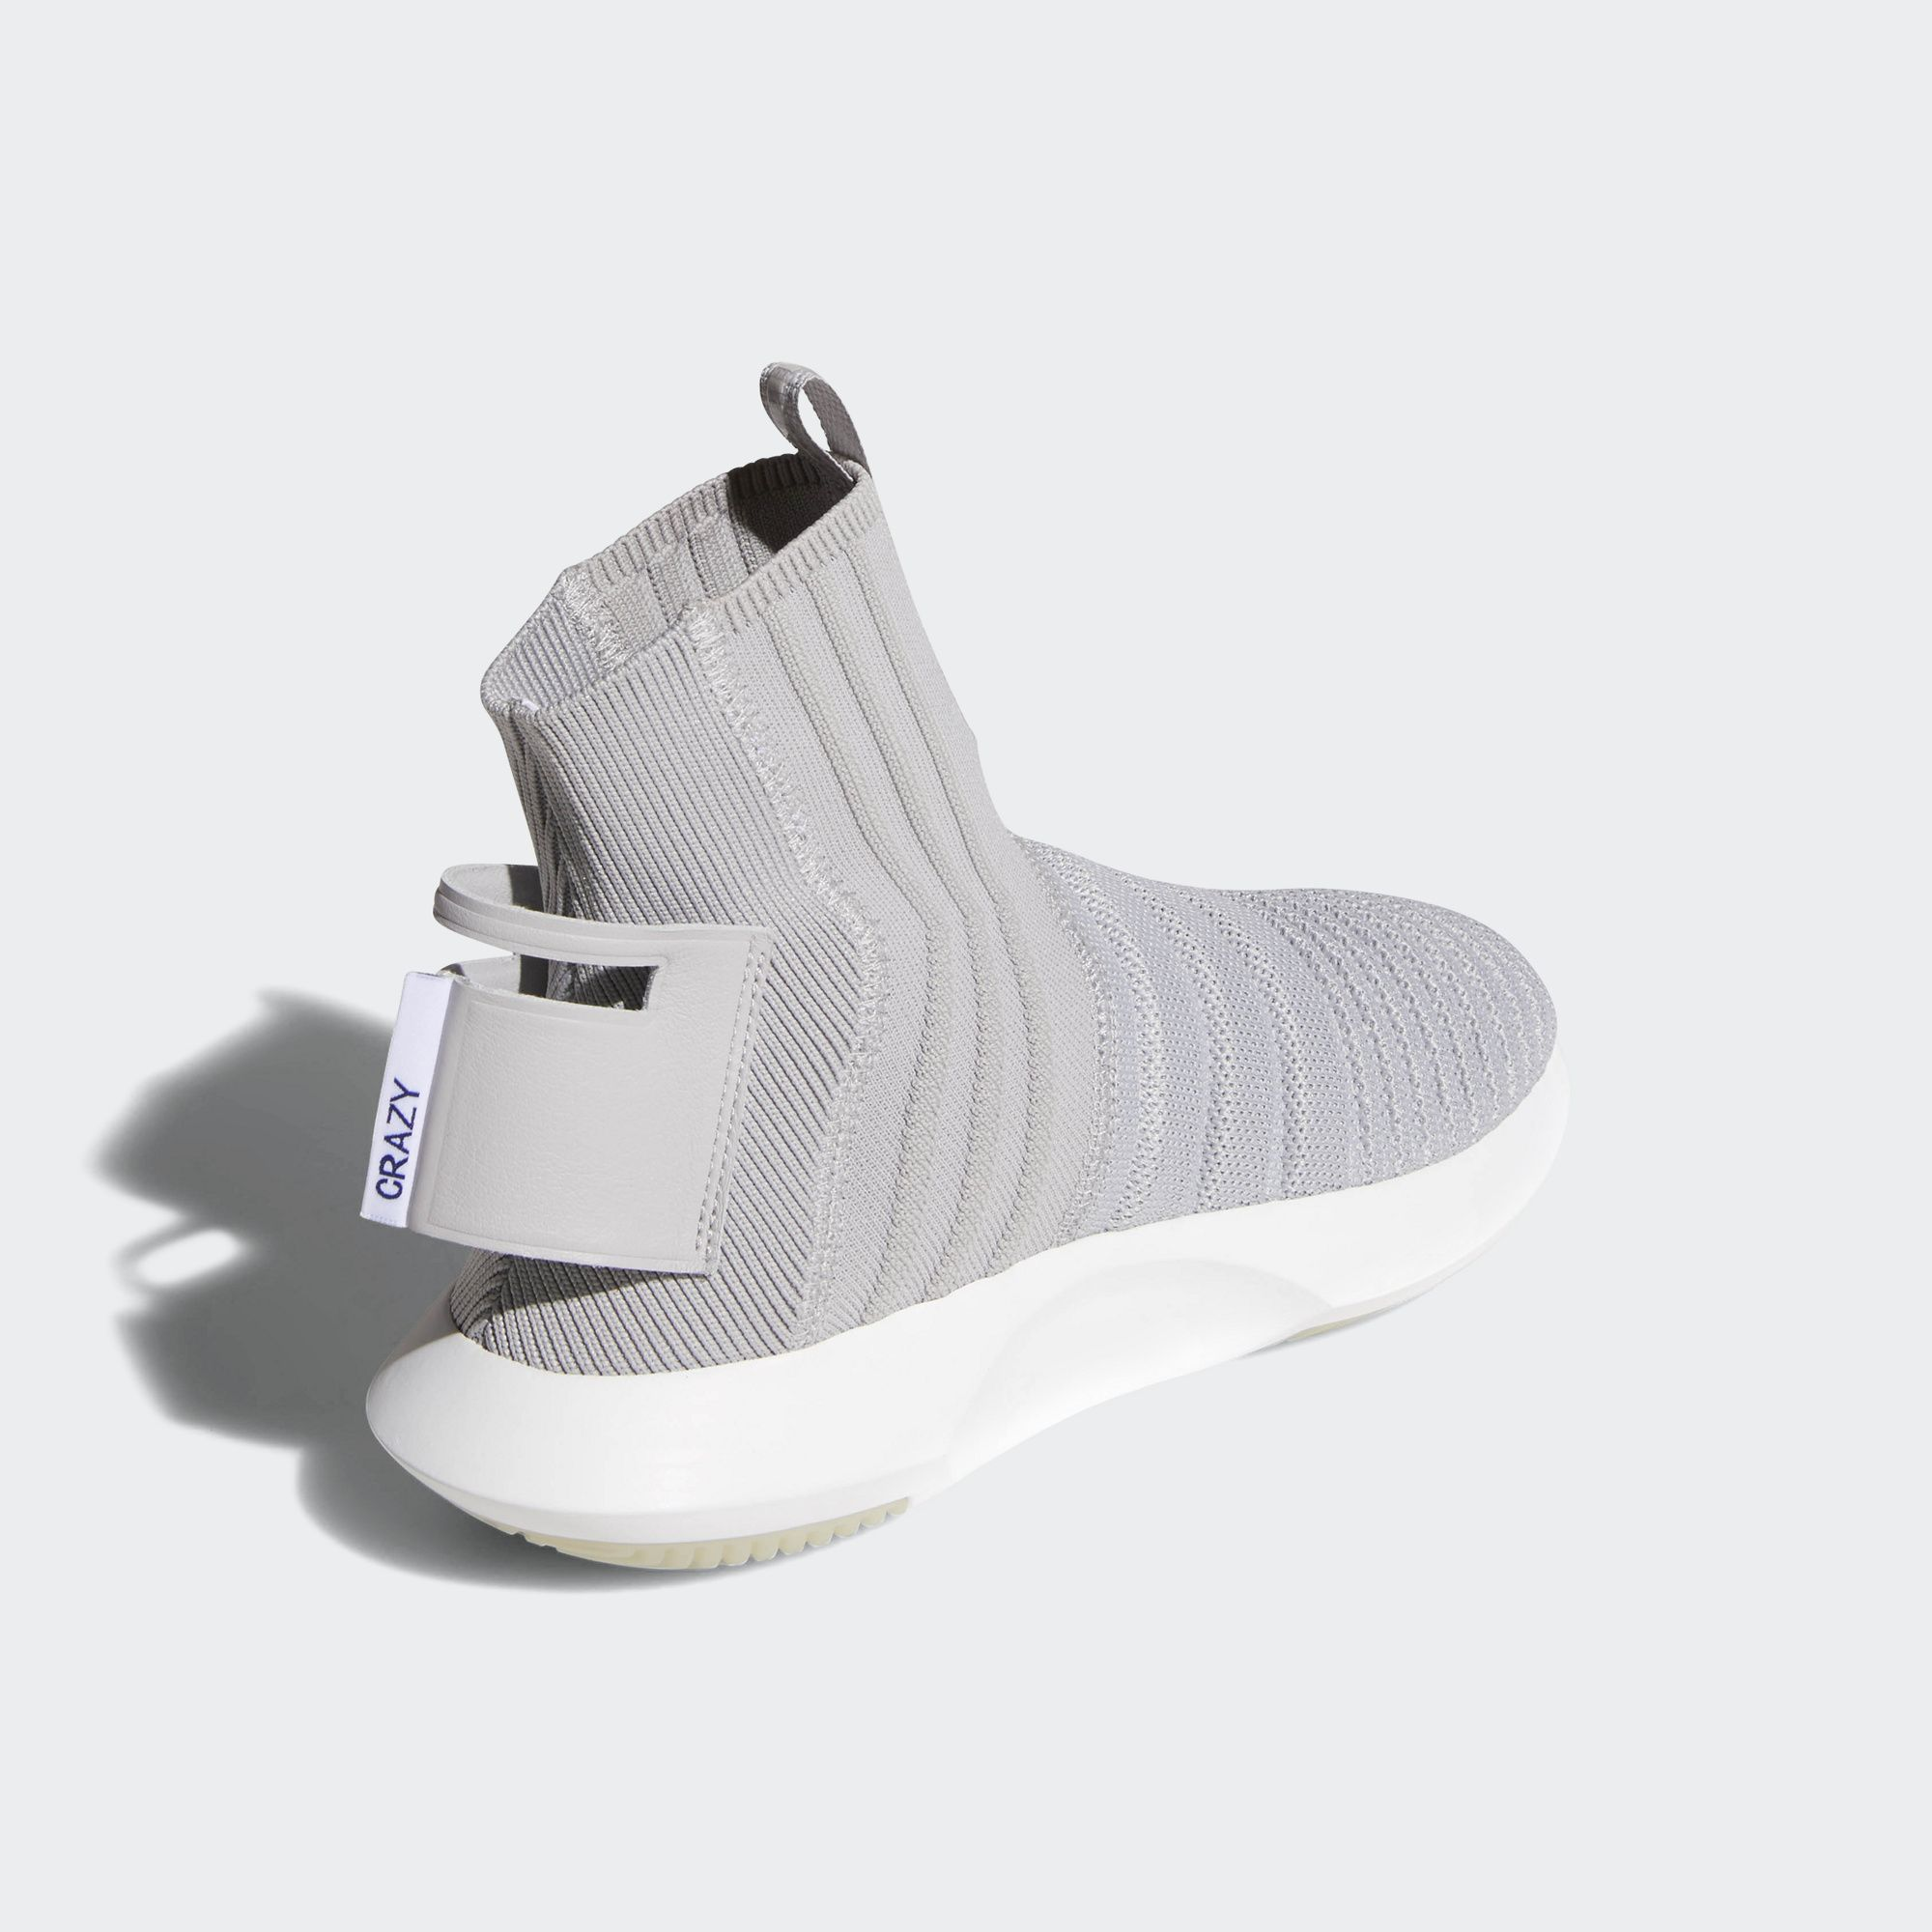 6f2872c71a39 ... adidas crazy 1 adv pk sock 10